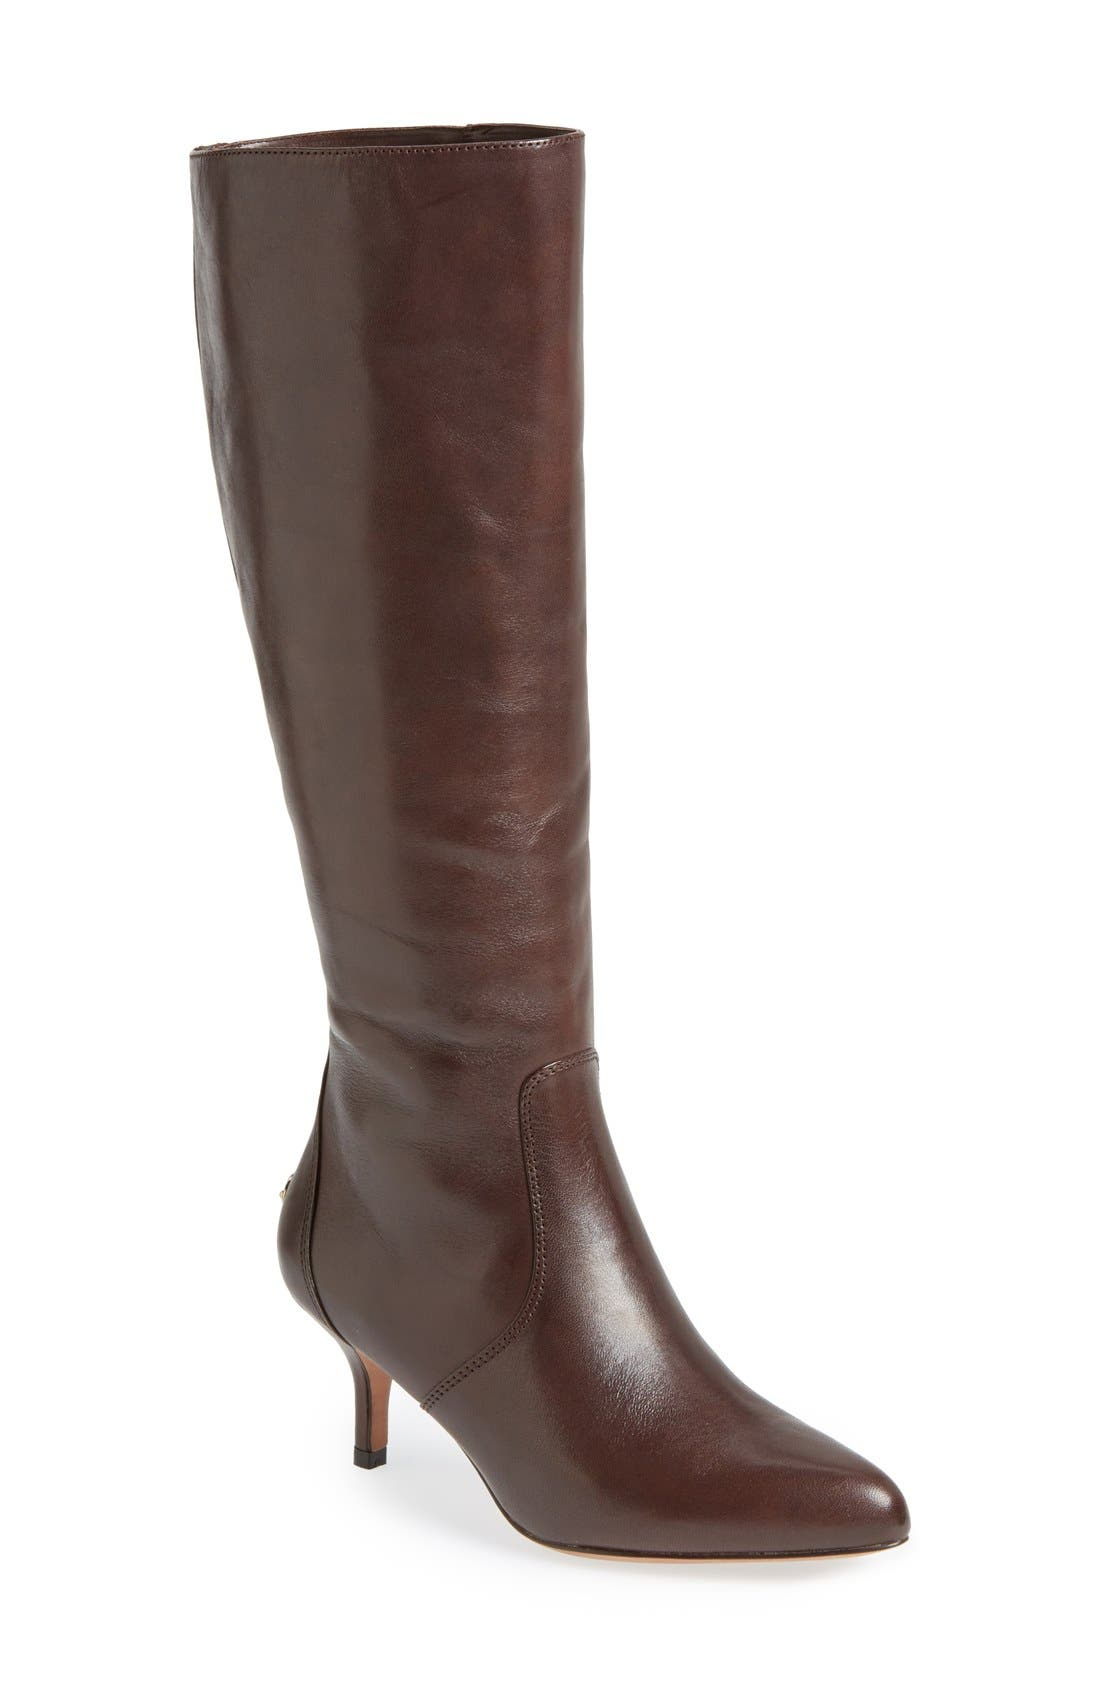 Main Image - COACH 'Foxy' Knee High Boot (Women)